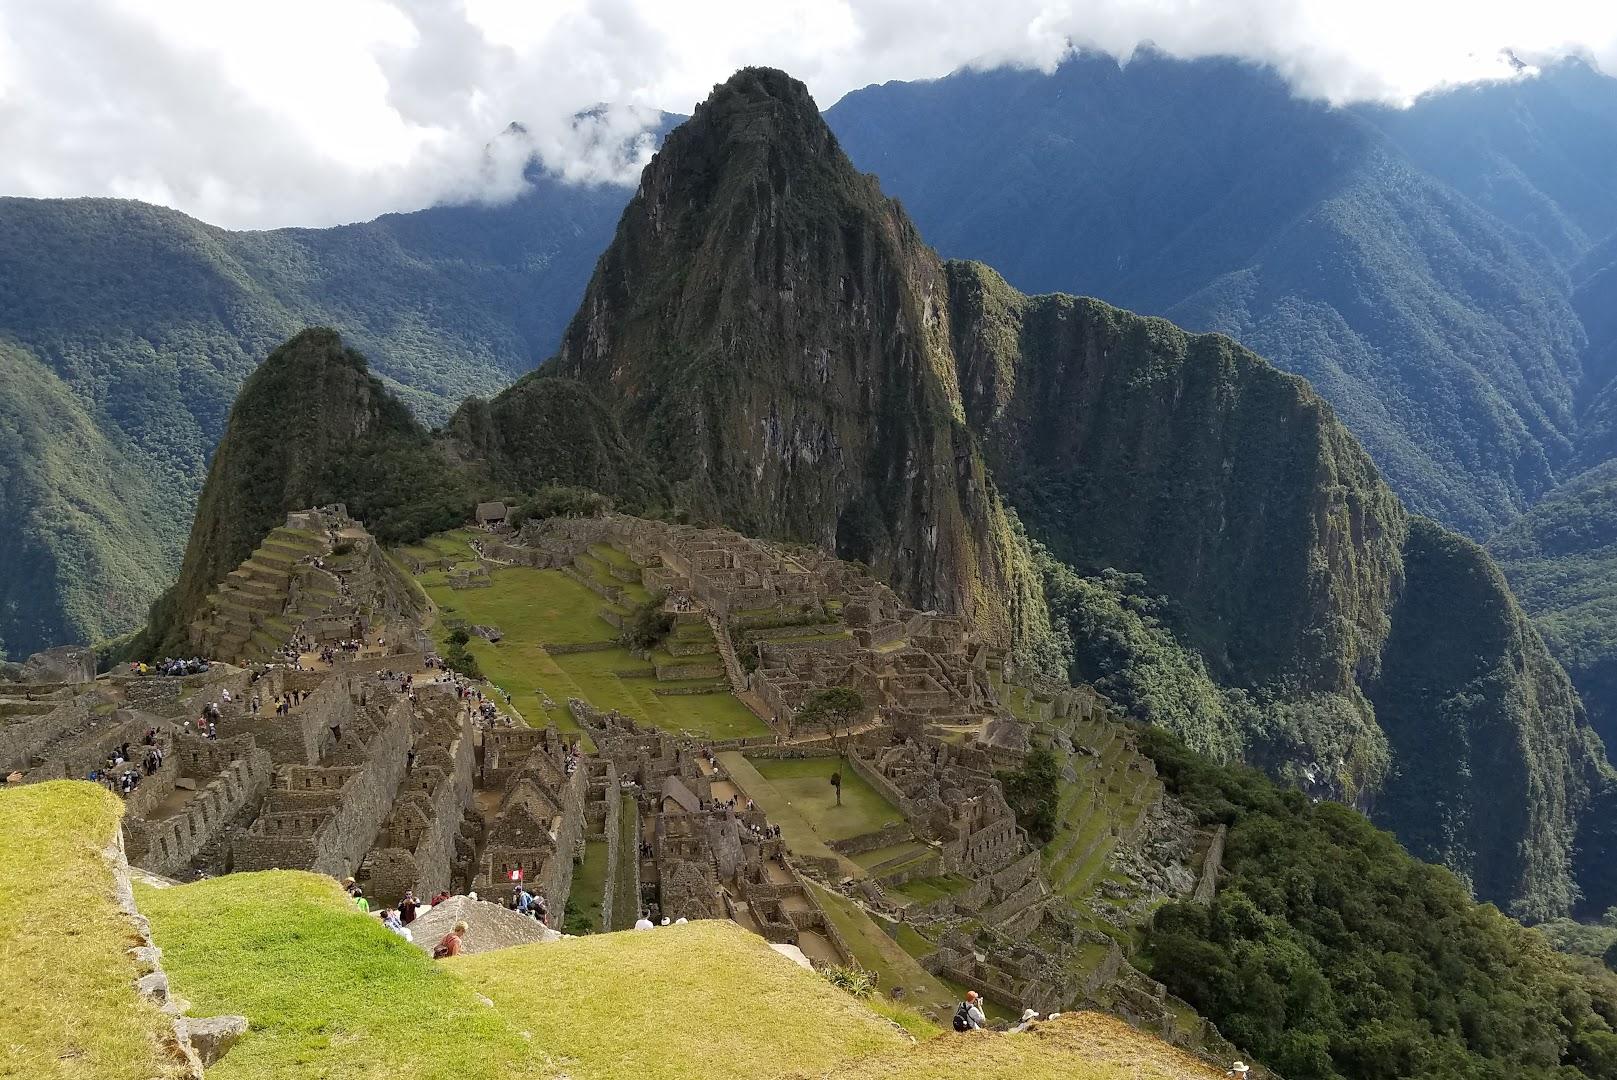 JConf Peru 2020 Conference Report